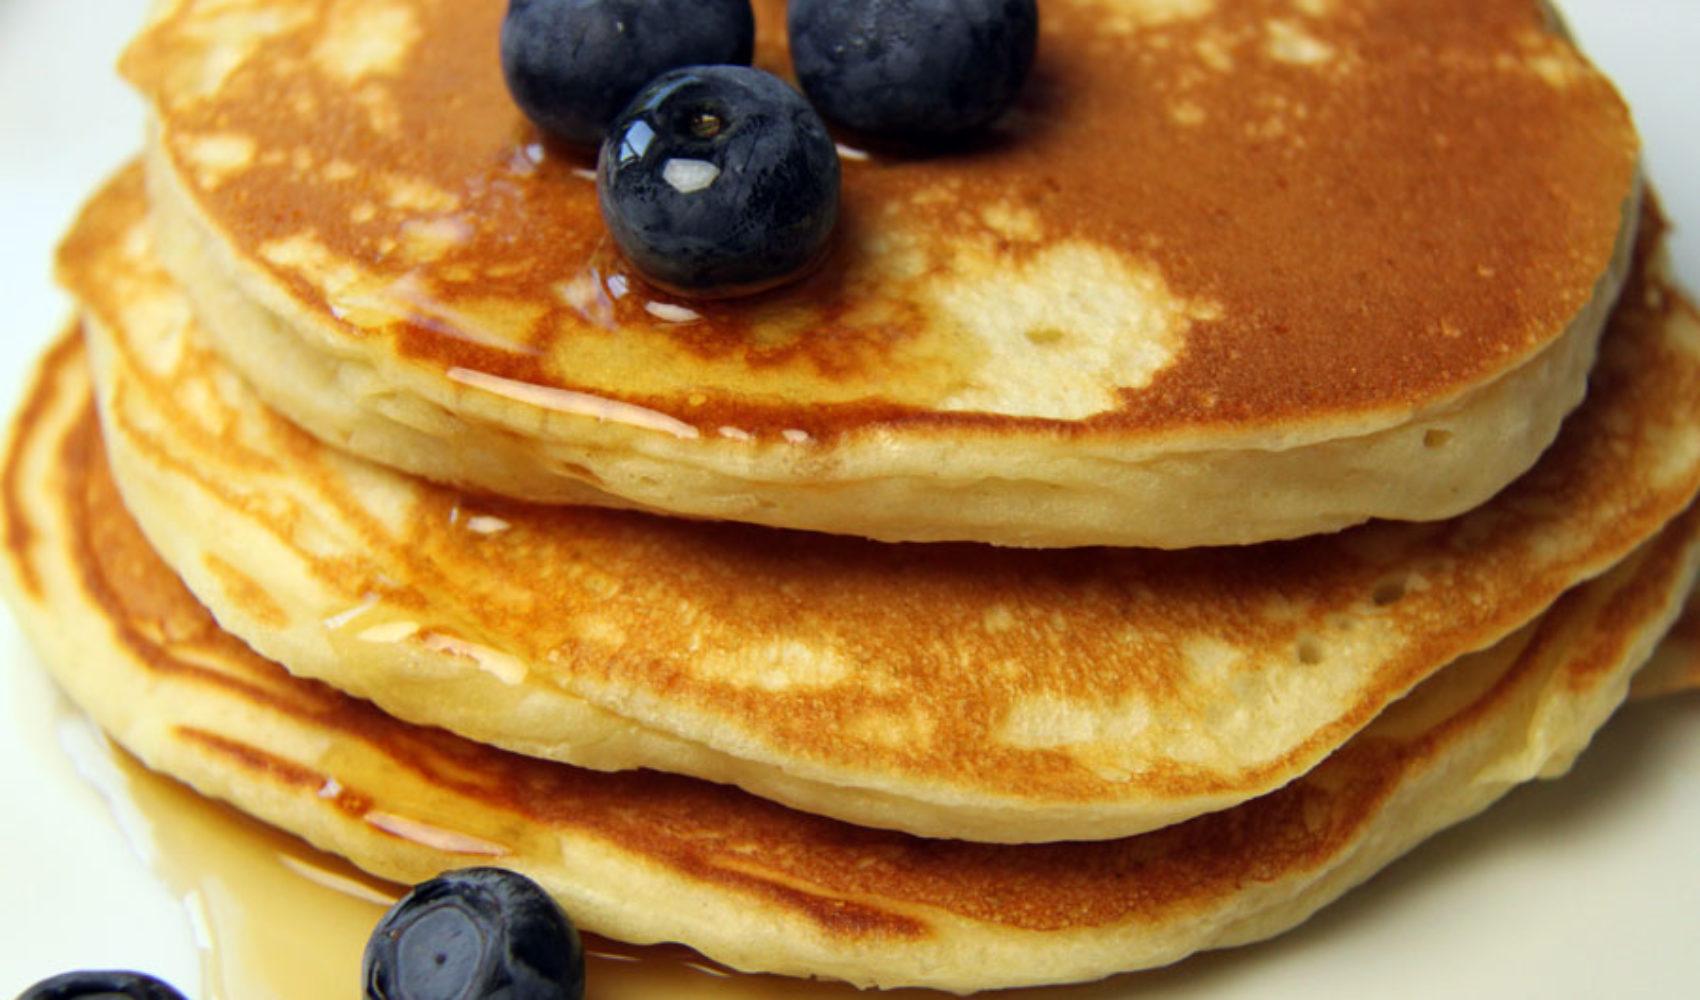 Dicke Pfannkuchen / Eierkuchen backen? (Ernährung, Sport